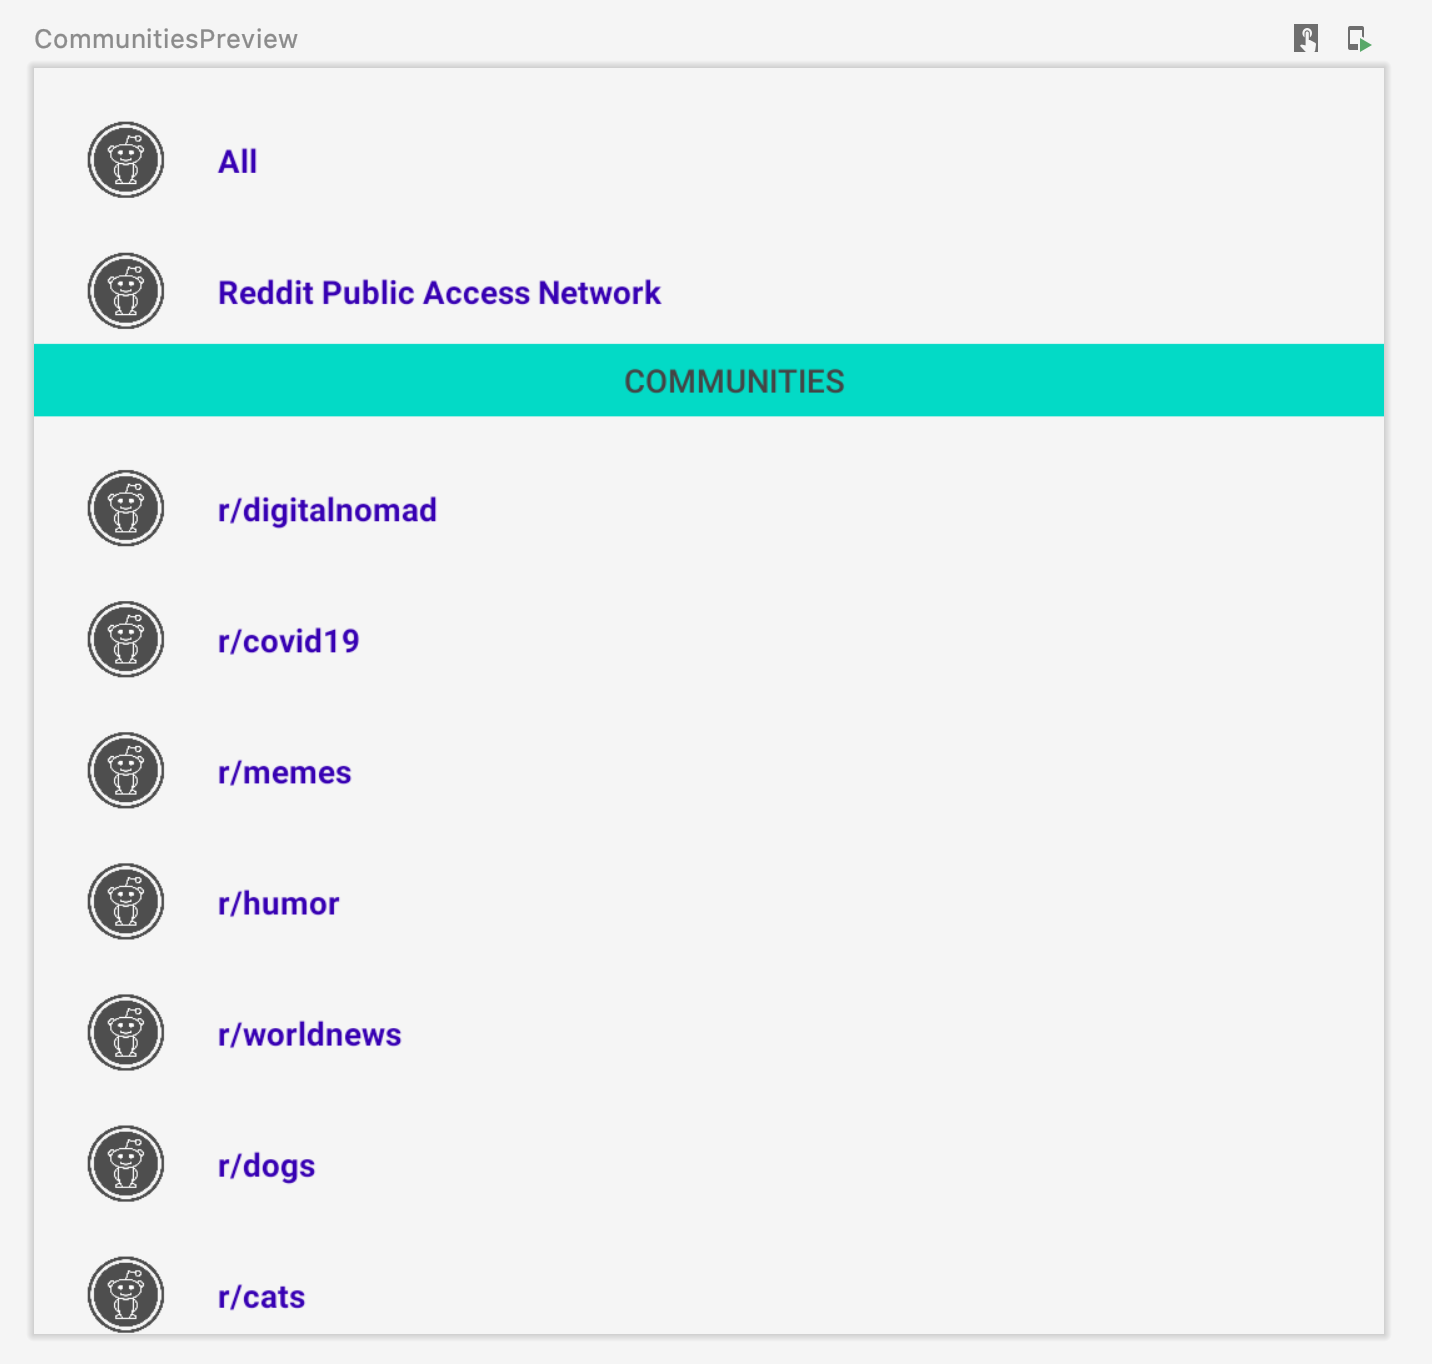 Communities Preview